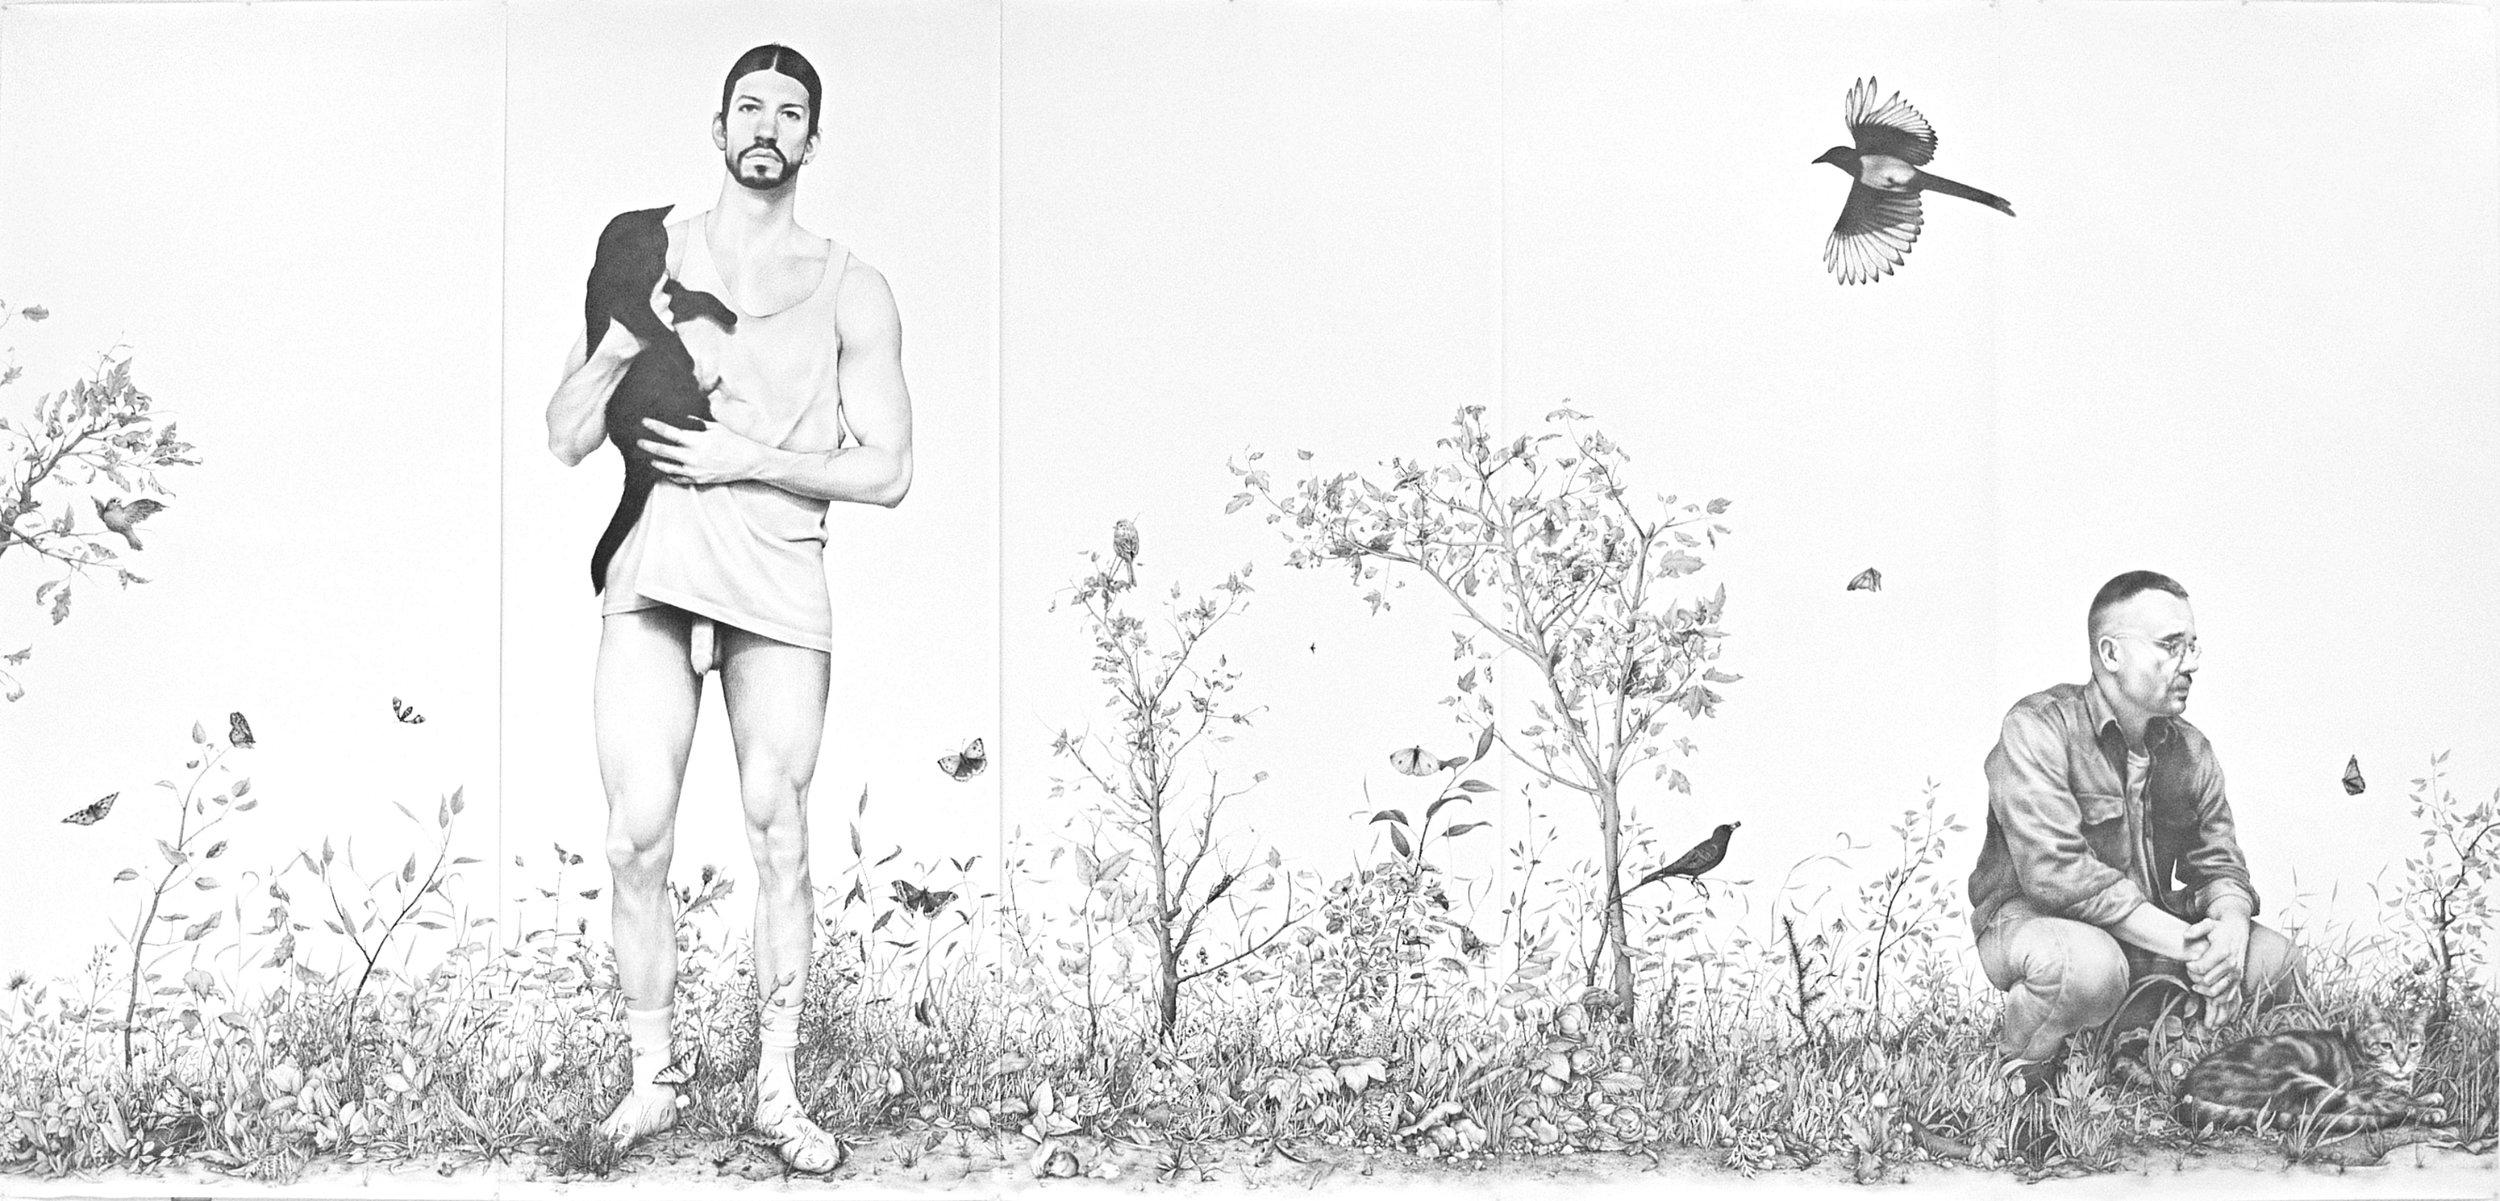 Zachari Logan,  Vignette , 2011, graphite on paper, 108 x 208 in. Photo courtesy of the artist.